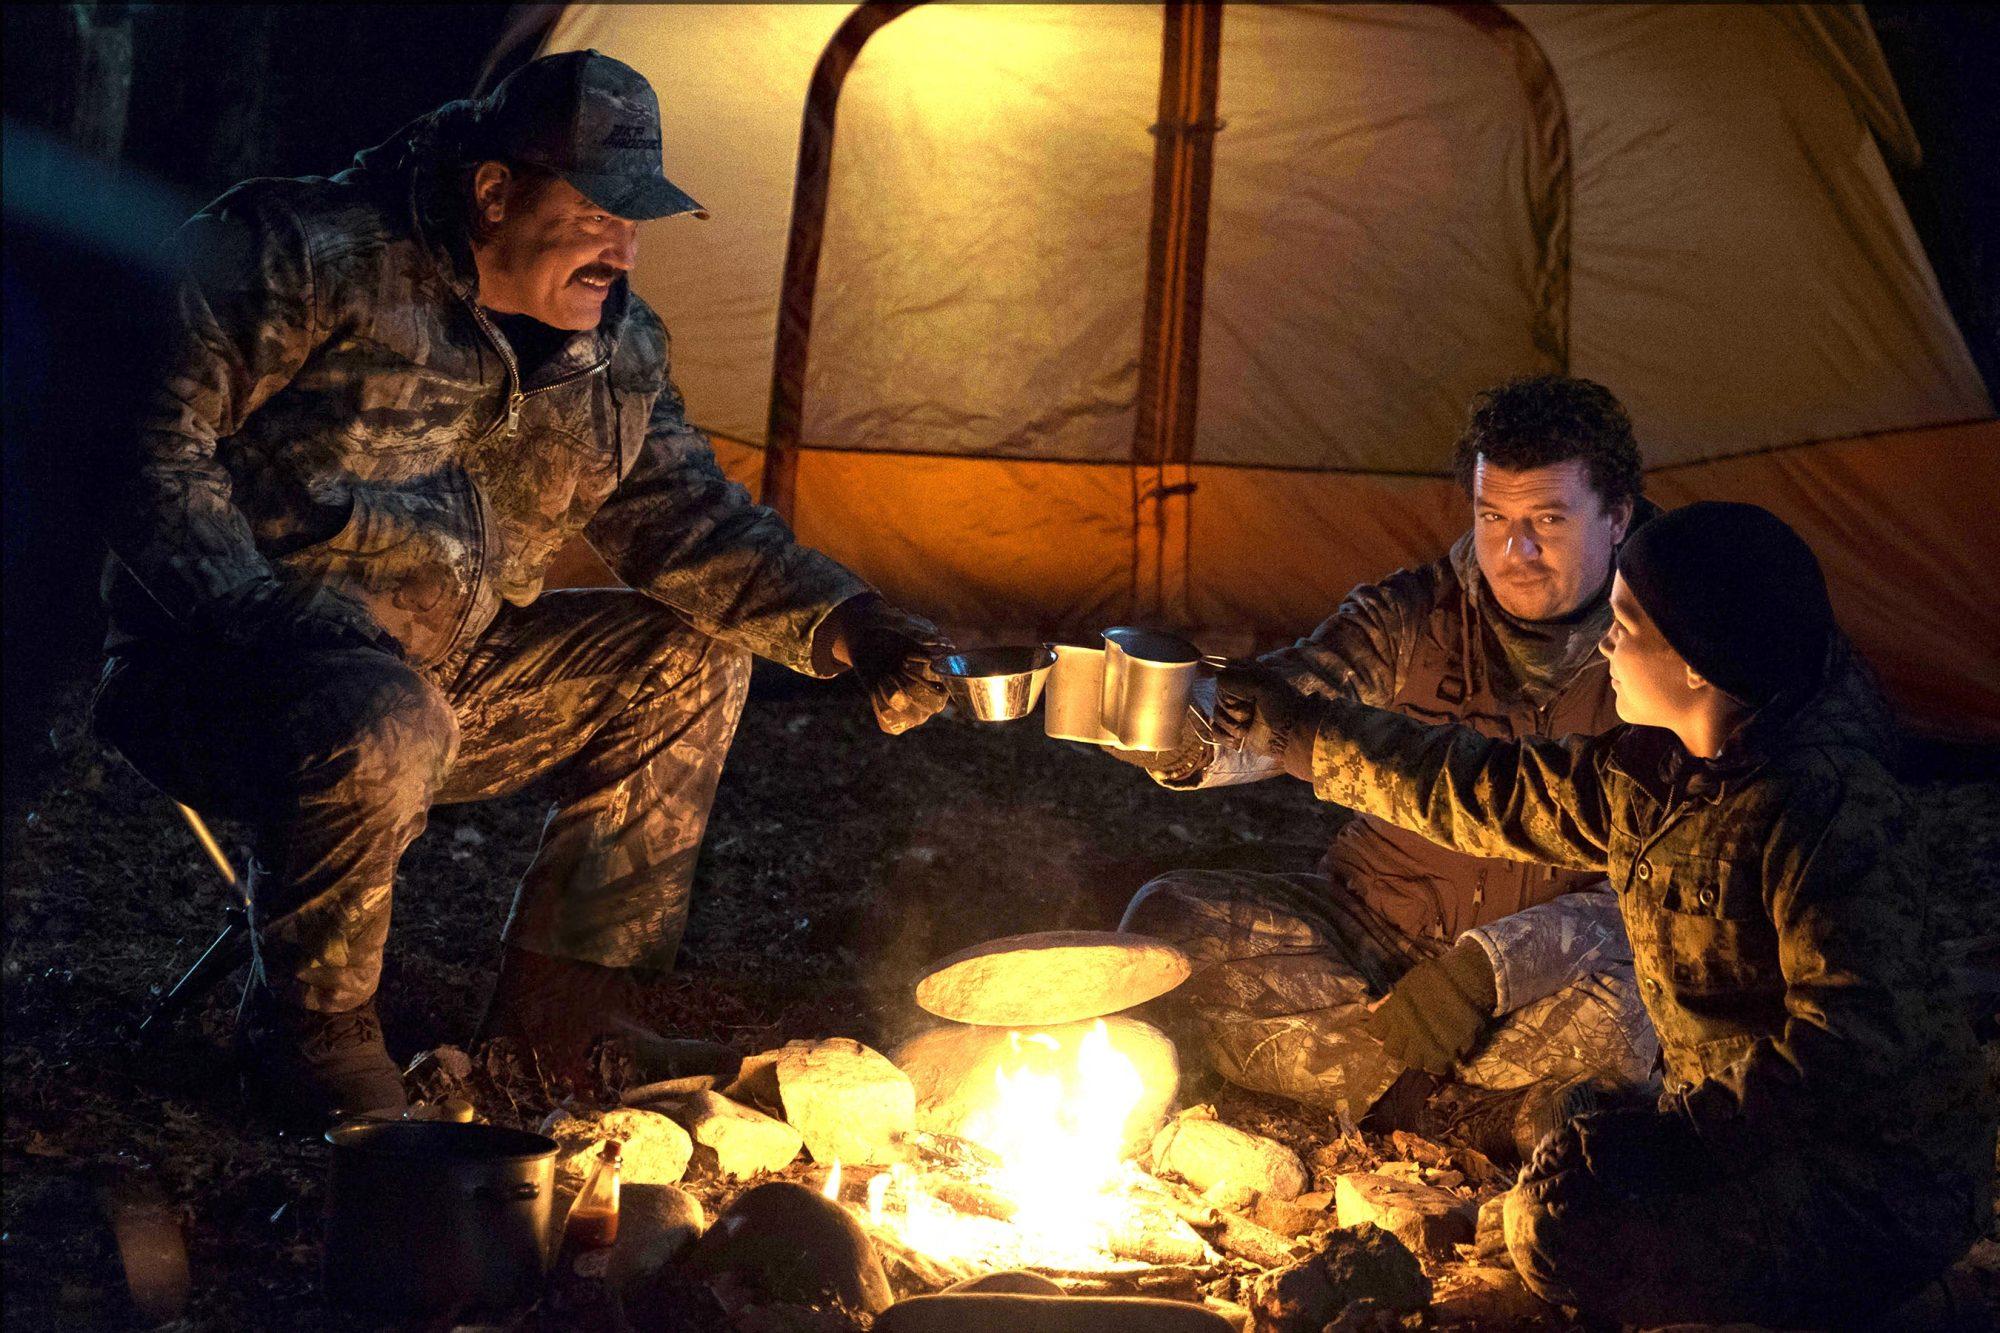 Legacy of a Whitetail Deer Hunter CR: Merrick Morton/Netflix